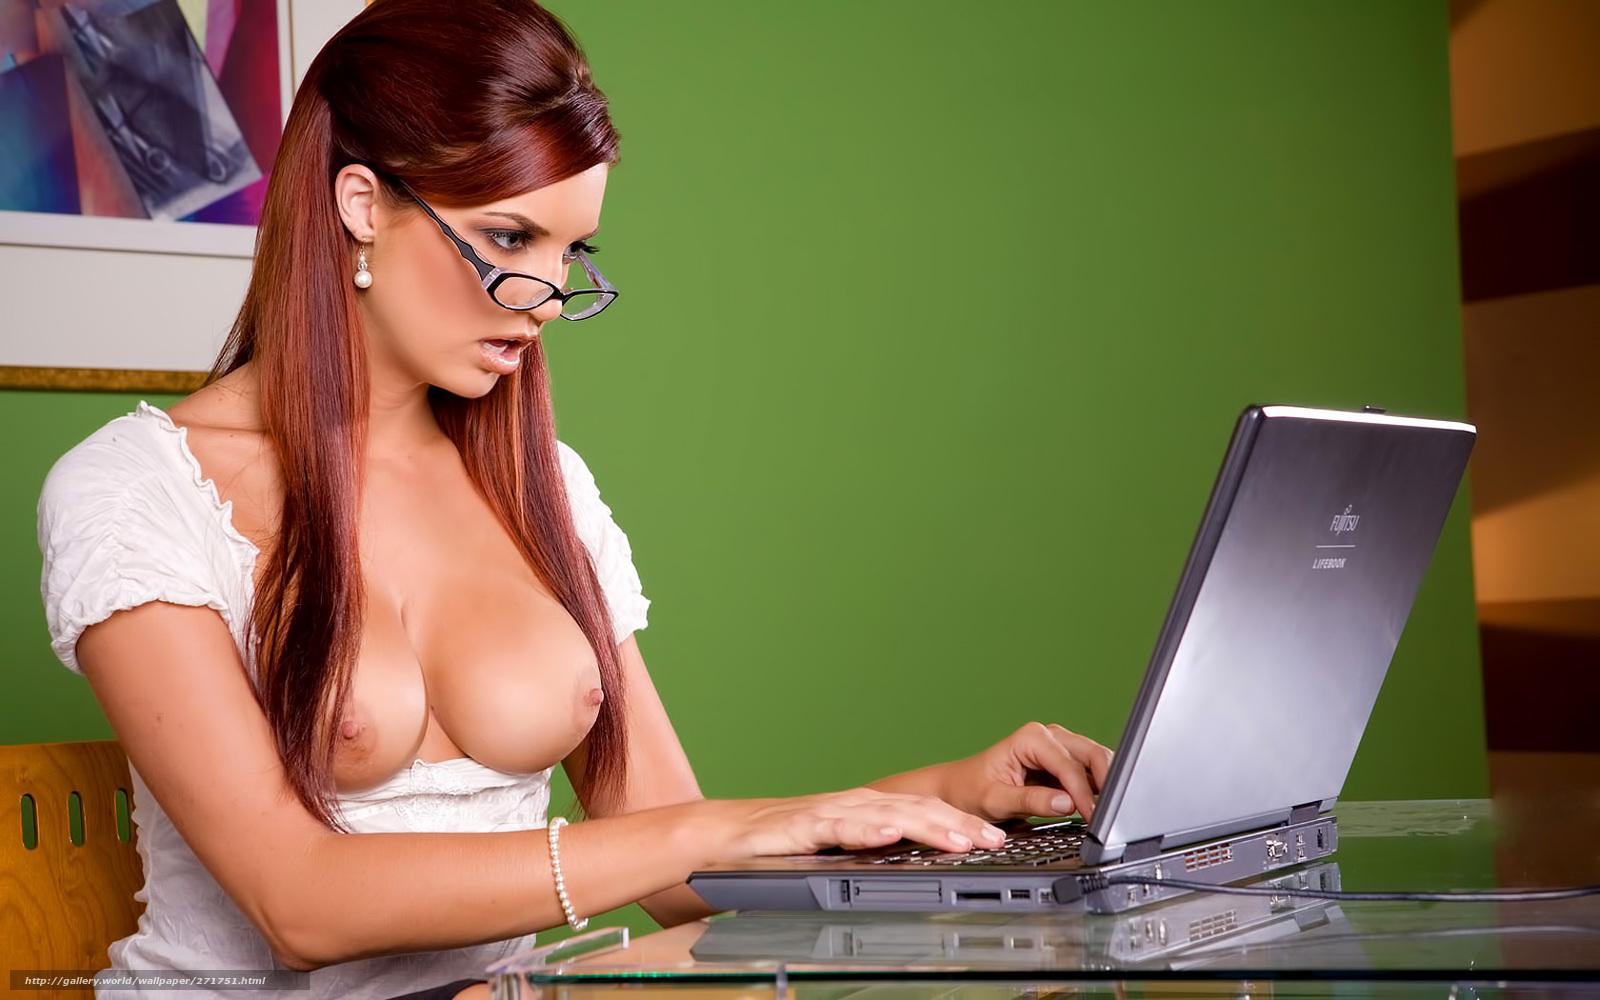 Simone style porn